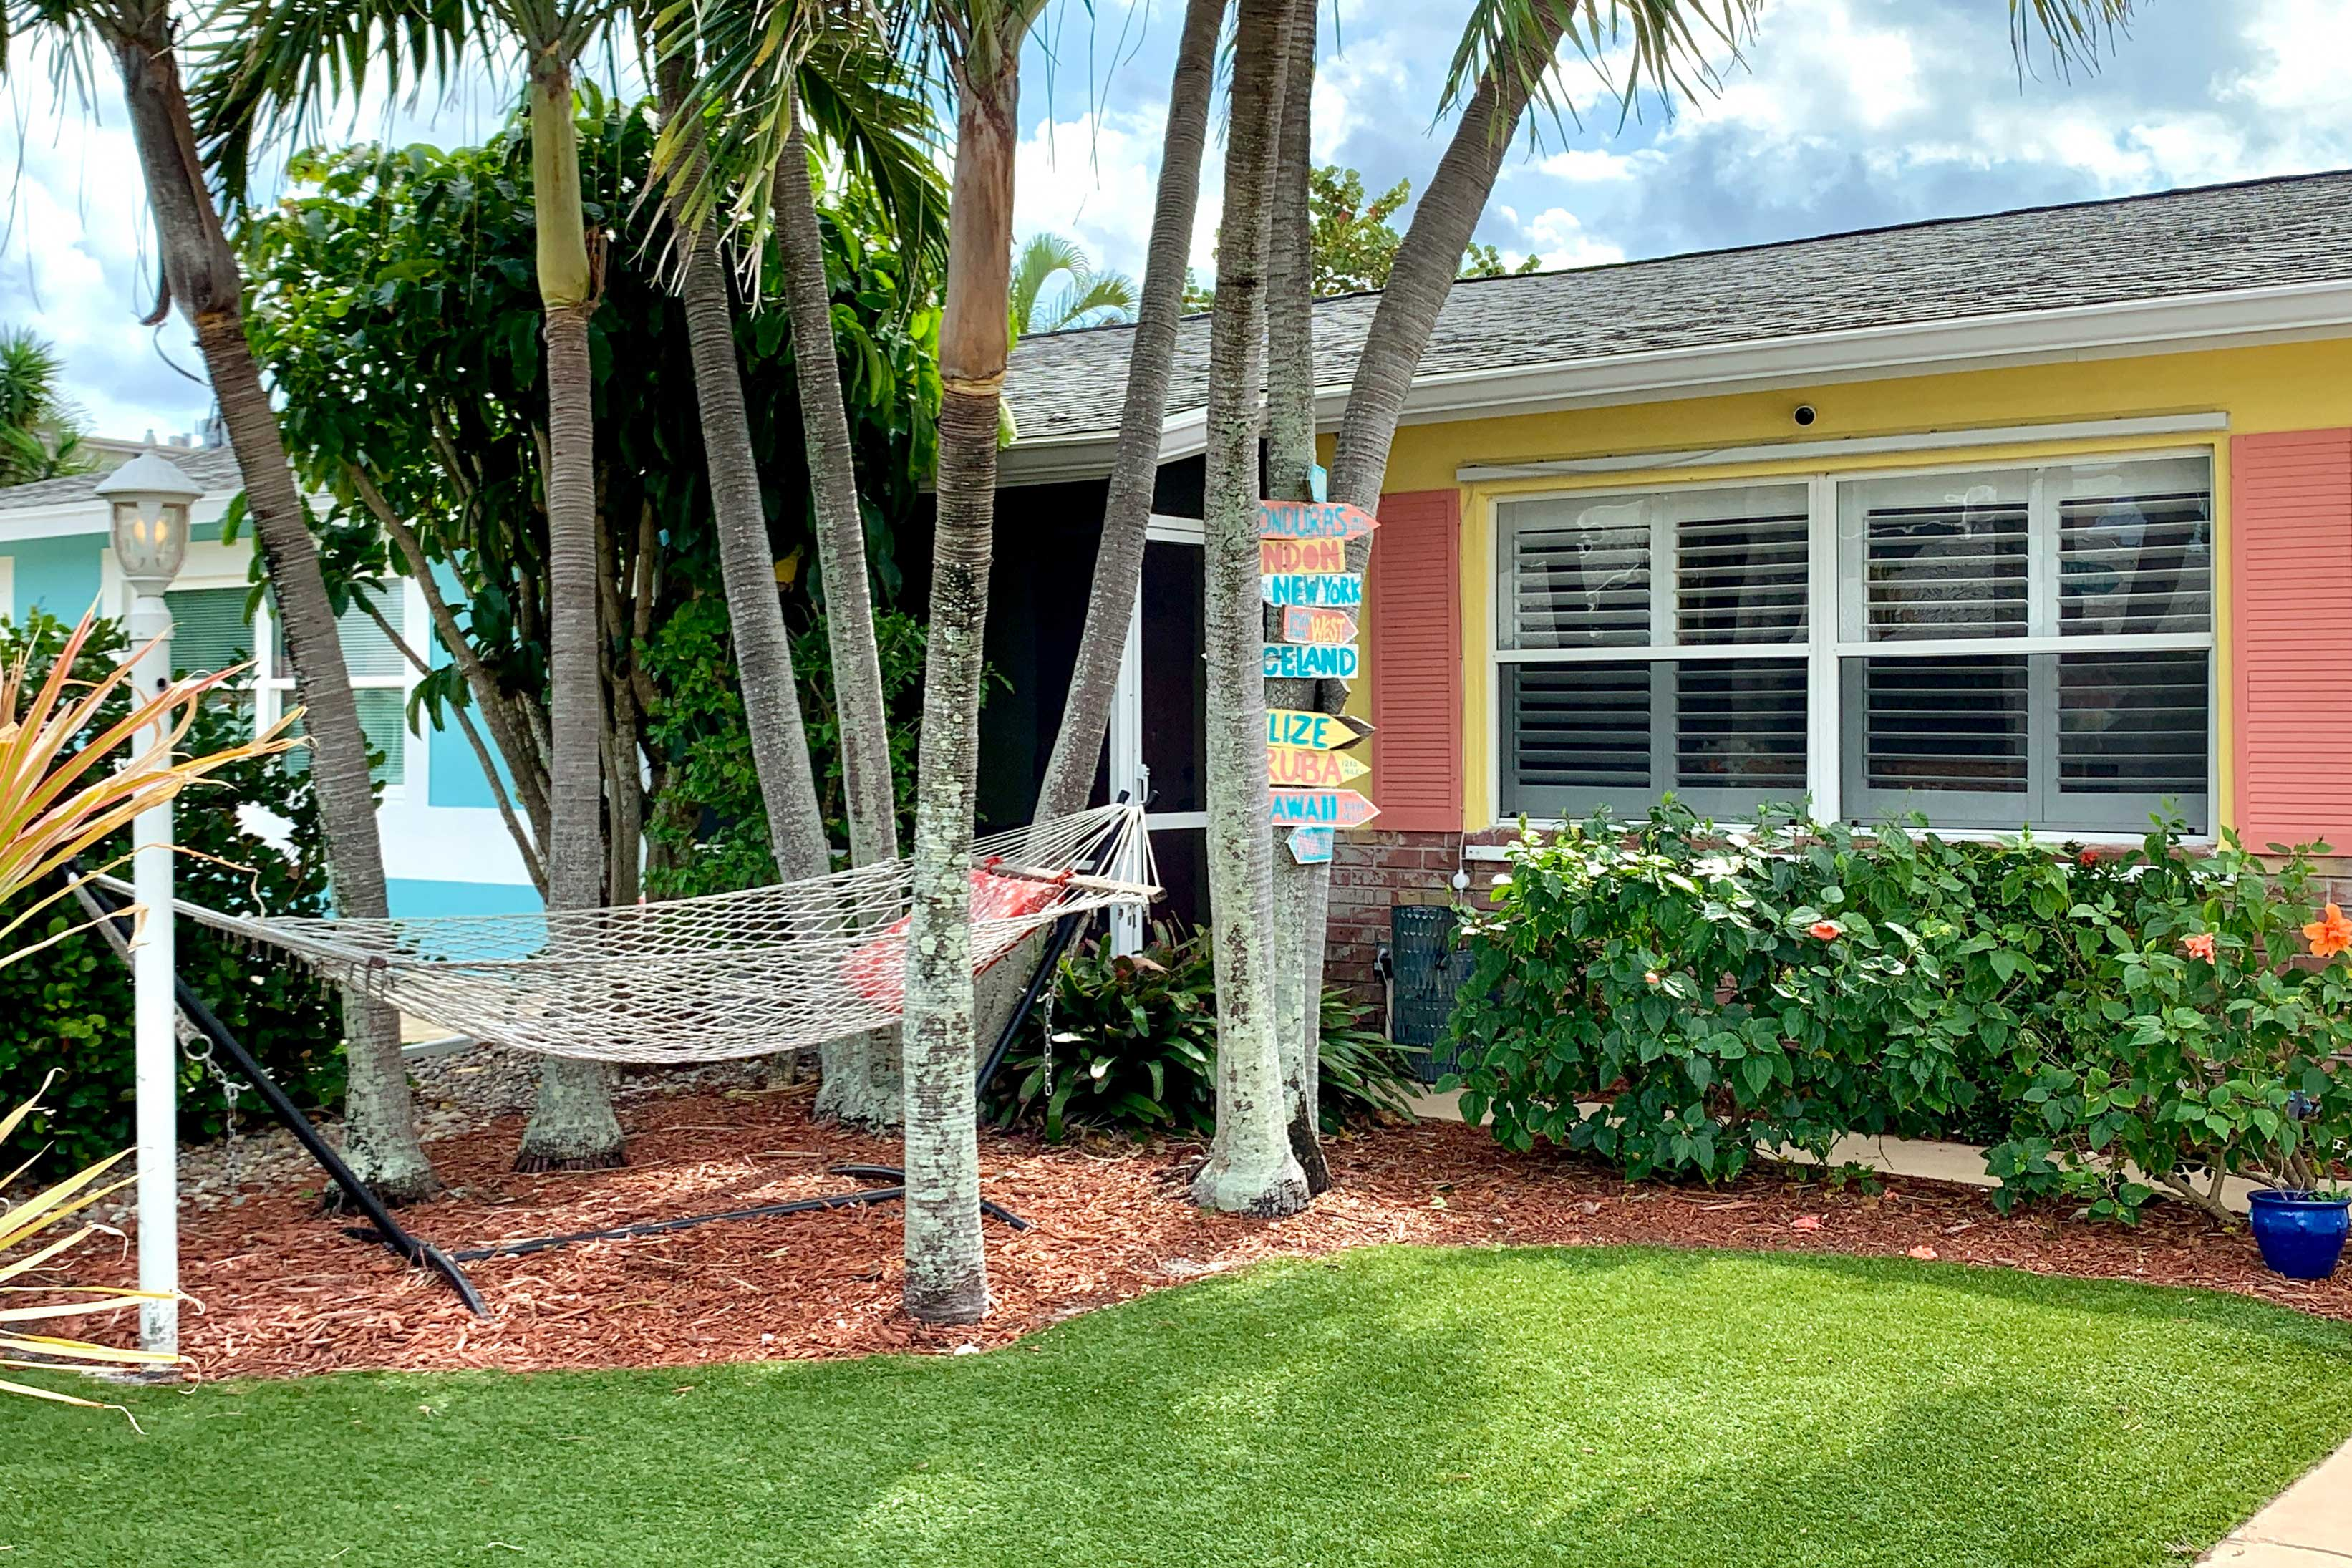 Jensen Beach, Florida is the perfect escape.